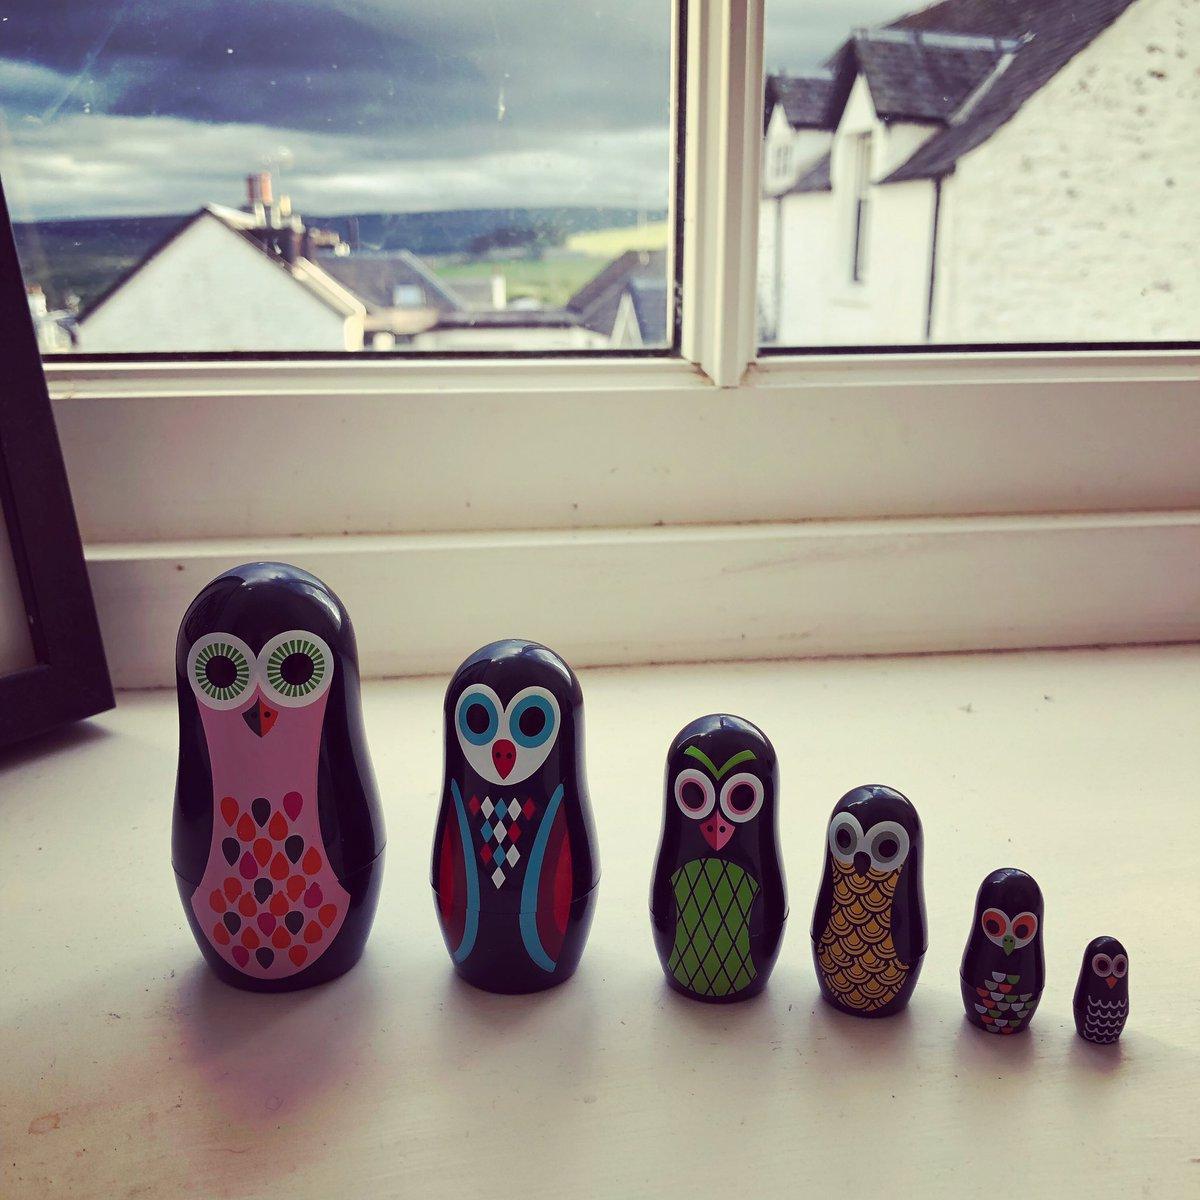 My little owl matryoshka dolls watching me edit. Thanks @lisadransfield 😊😊🦉